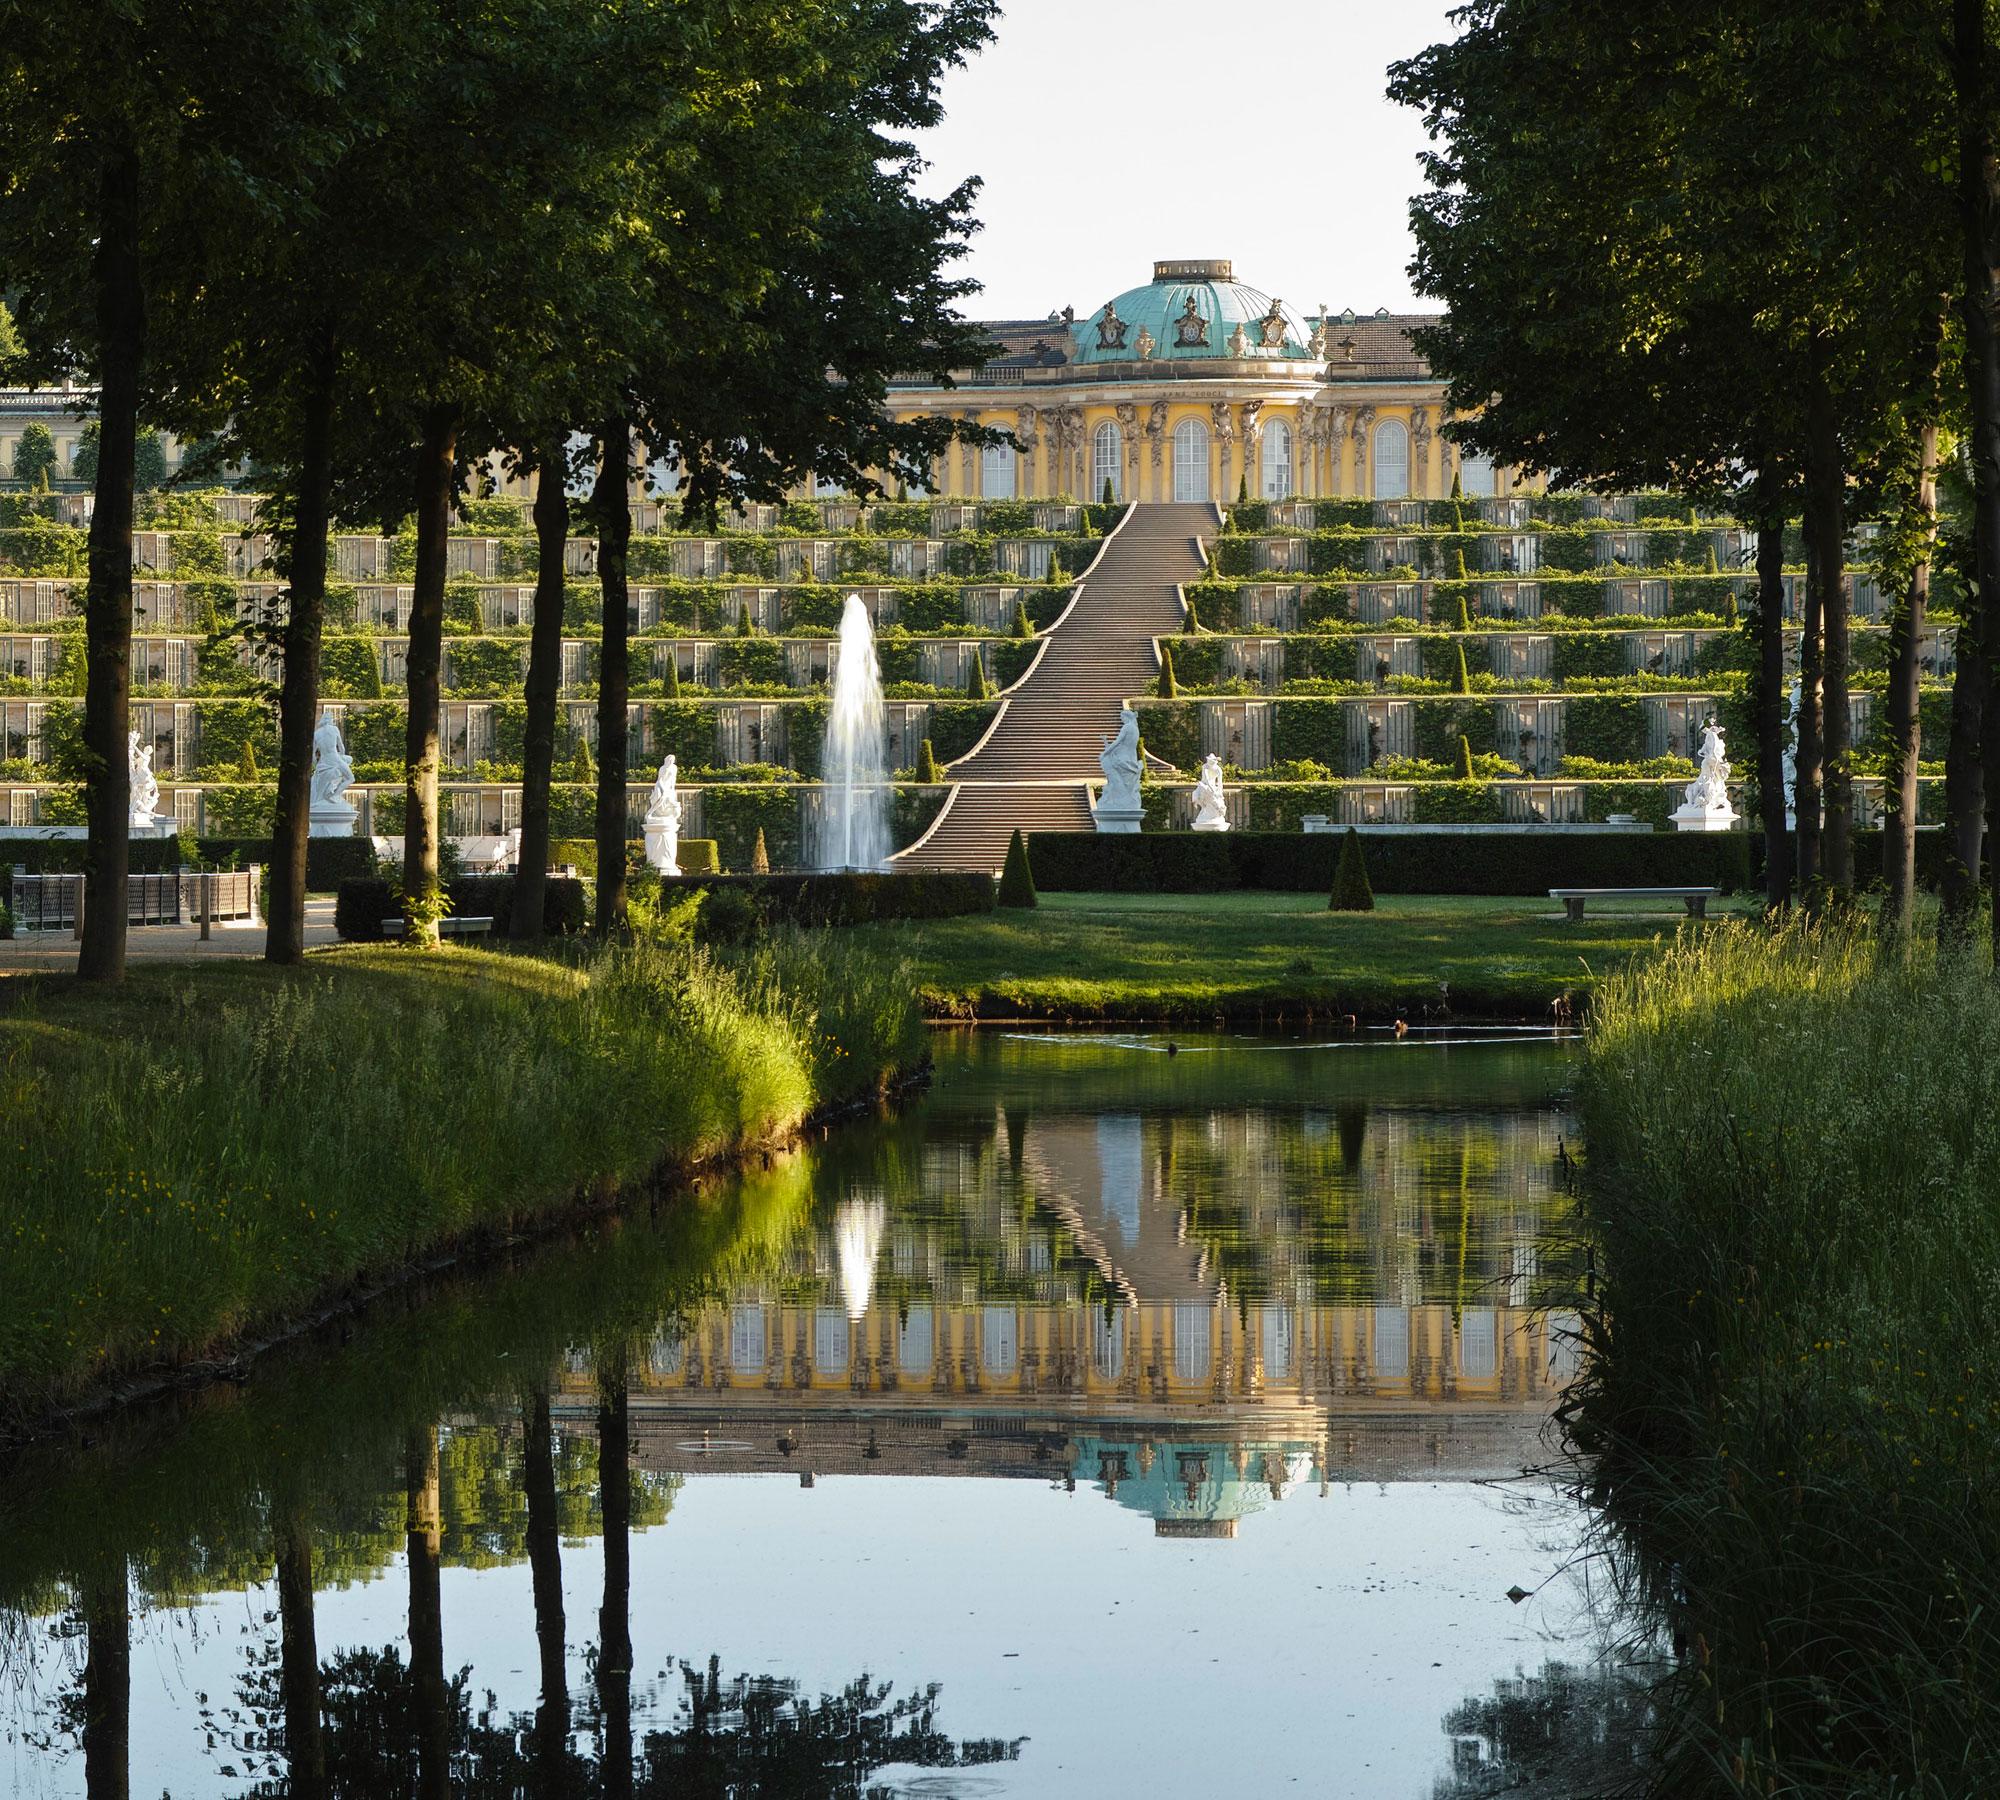 Offen in Potsdam – Ausflugszie für Familien: Park Sanssouci // HIMBEER